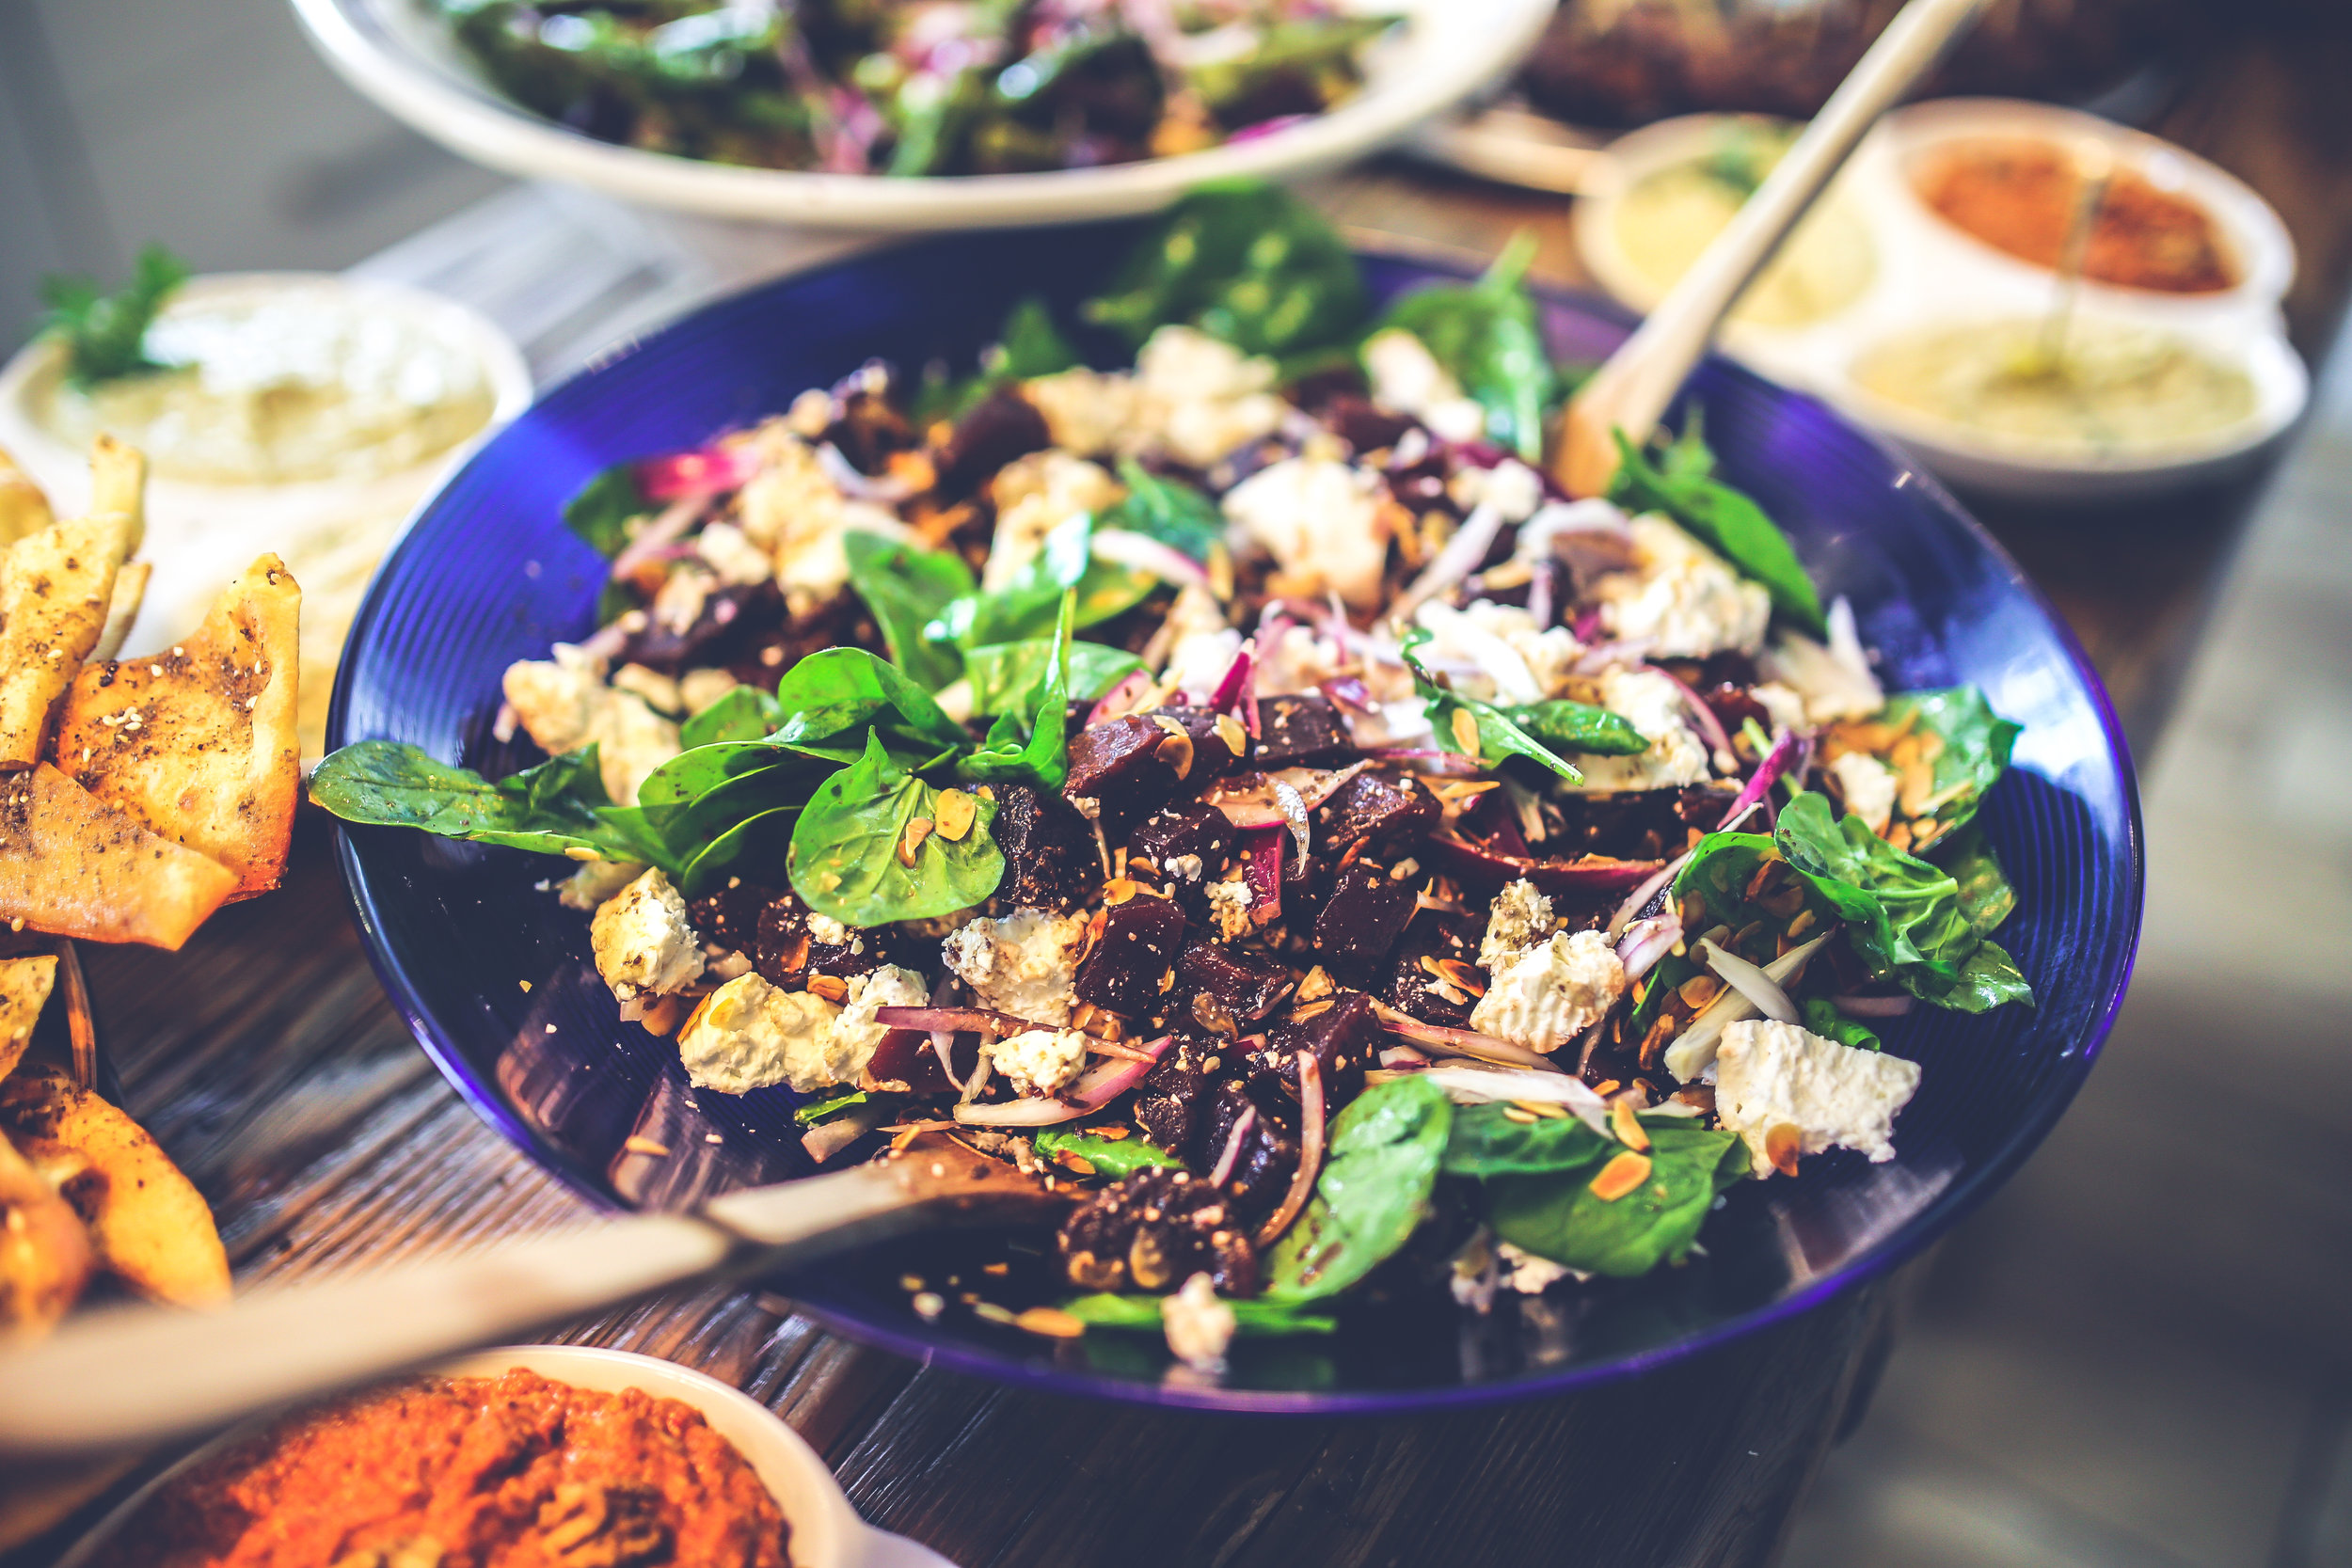 https://images.pexels.com/photos/5928/salad-healthy-diet-spinach.jpg?w=1260&h=750&auto=compress&cs=tinysrgb